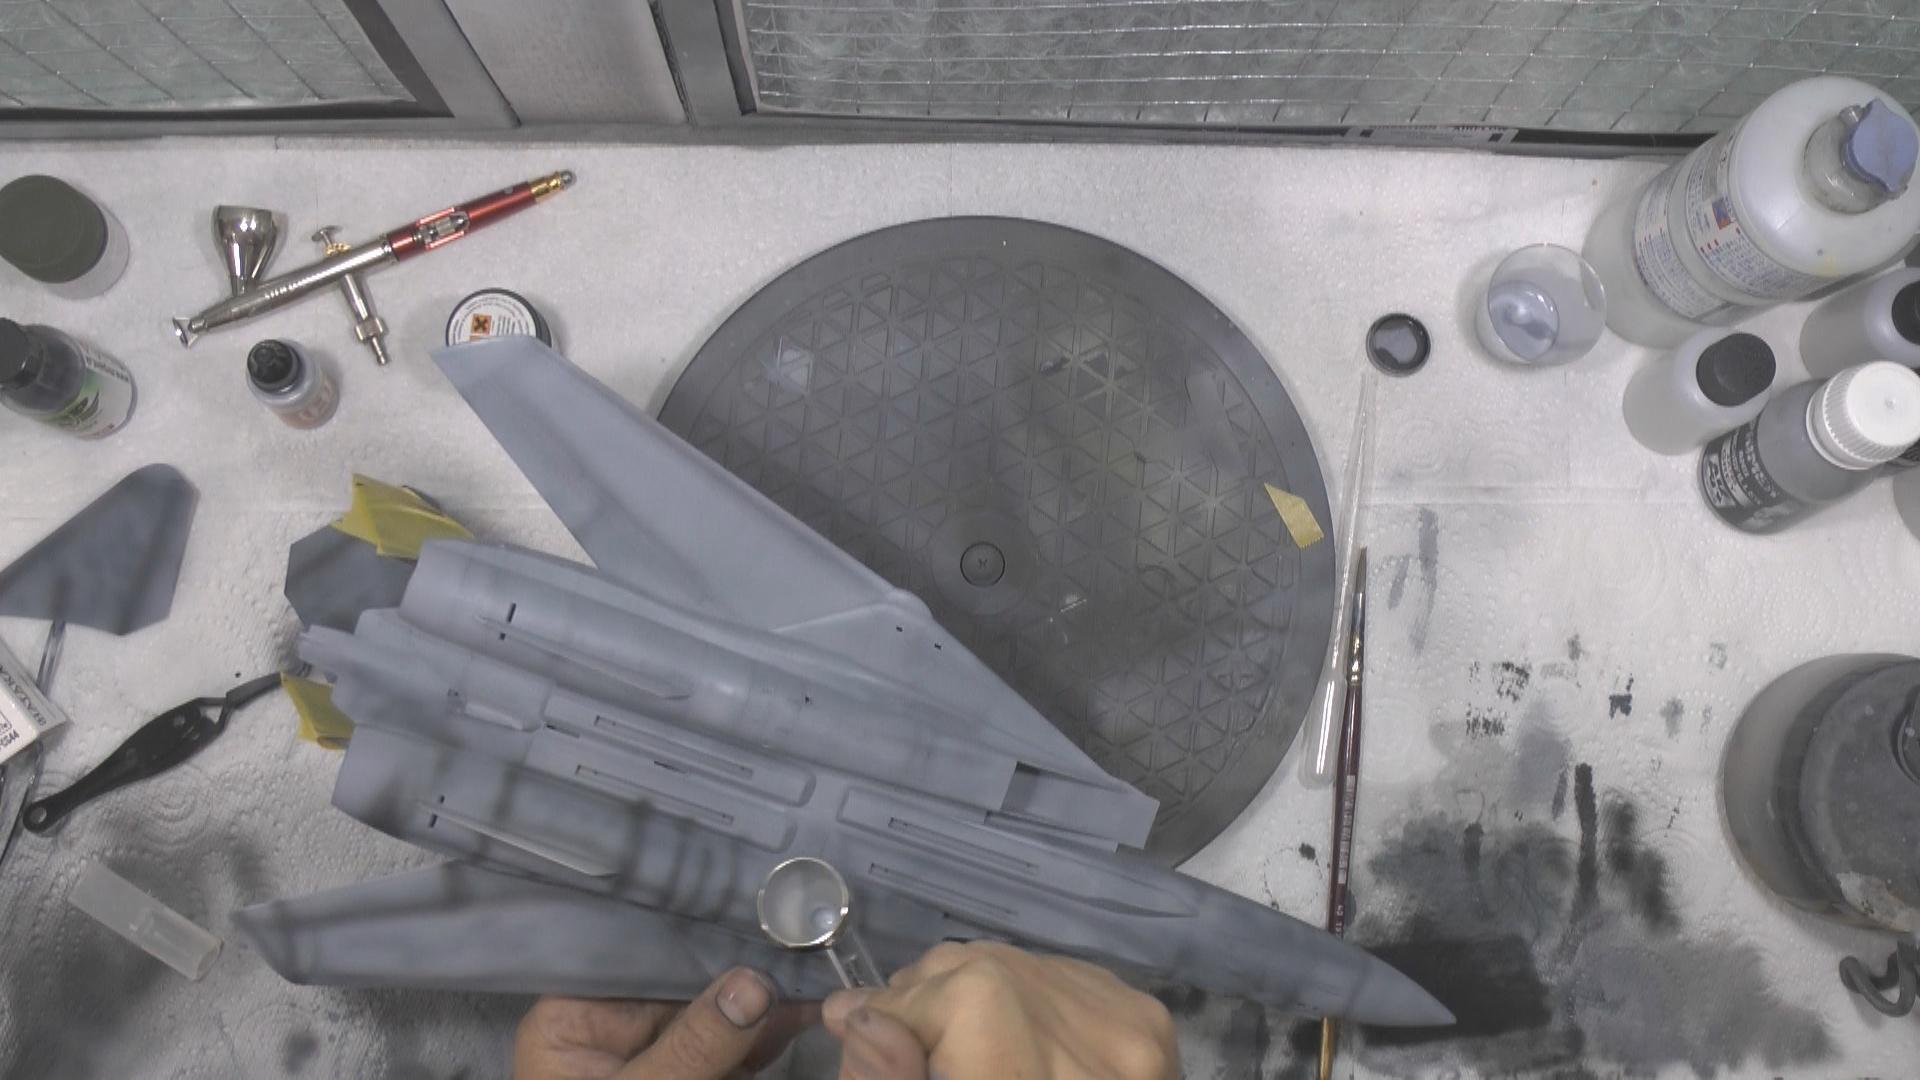 Tamiya Tomcat F14D Part 4 Pic 2.jpg